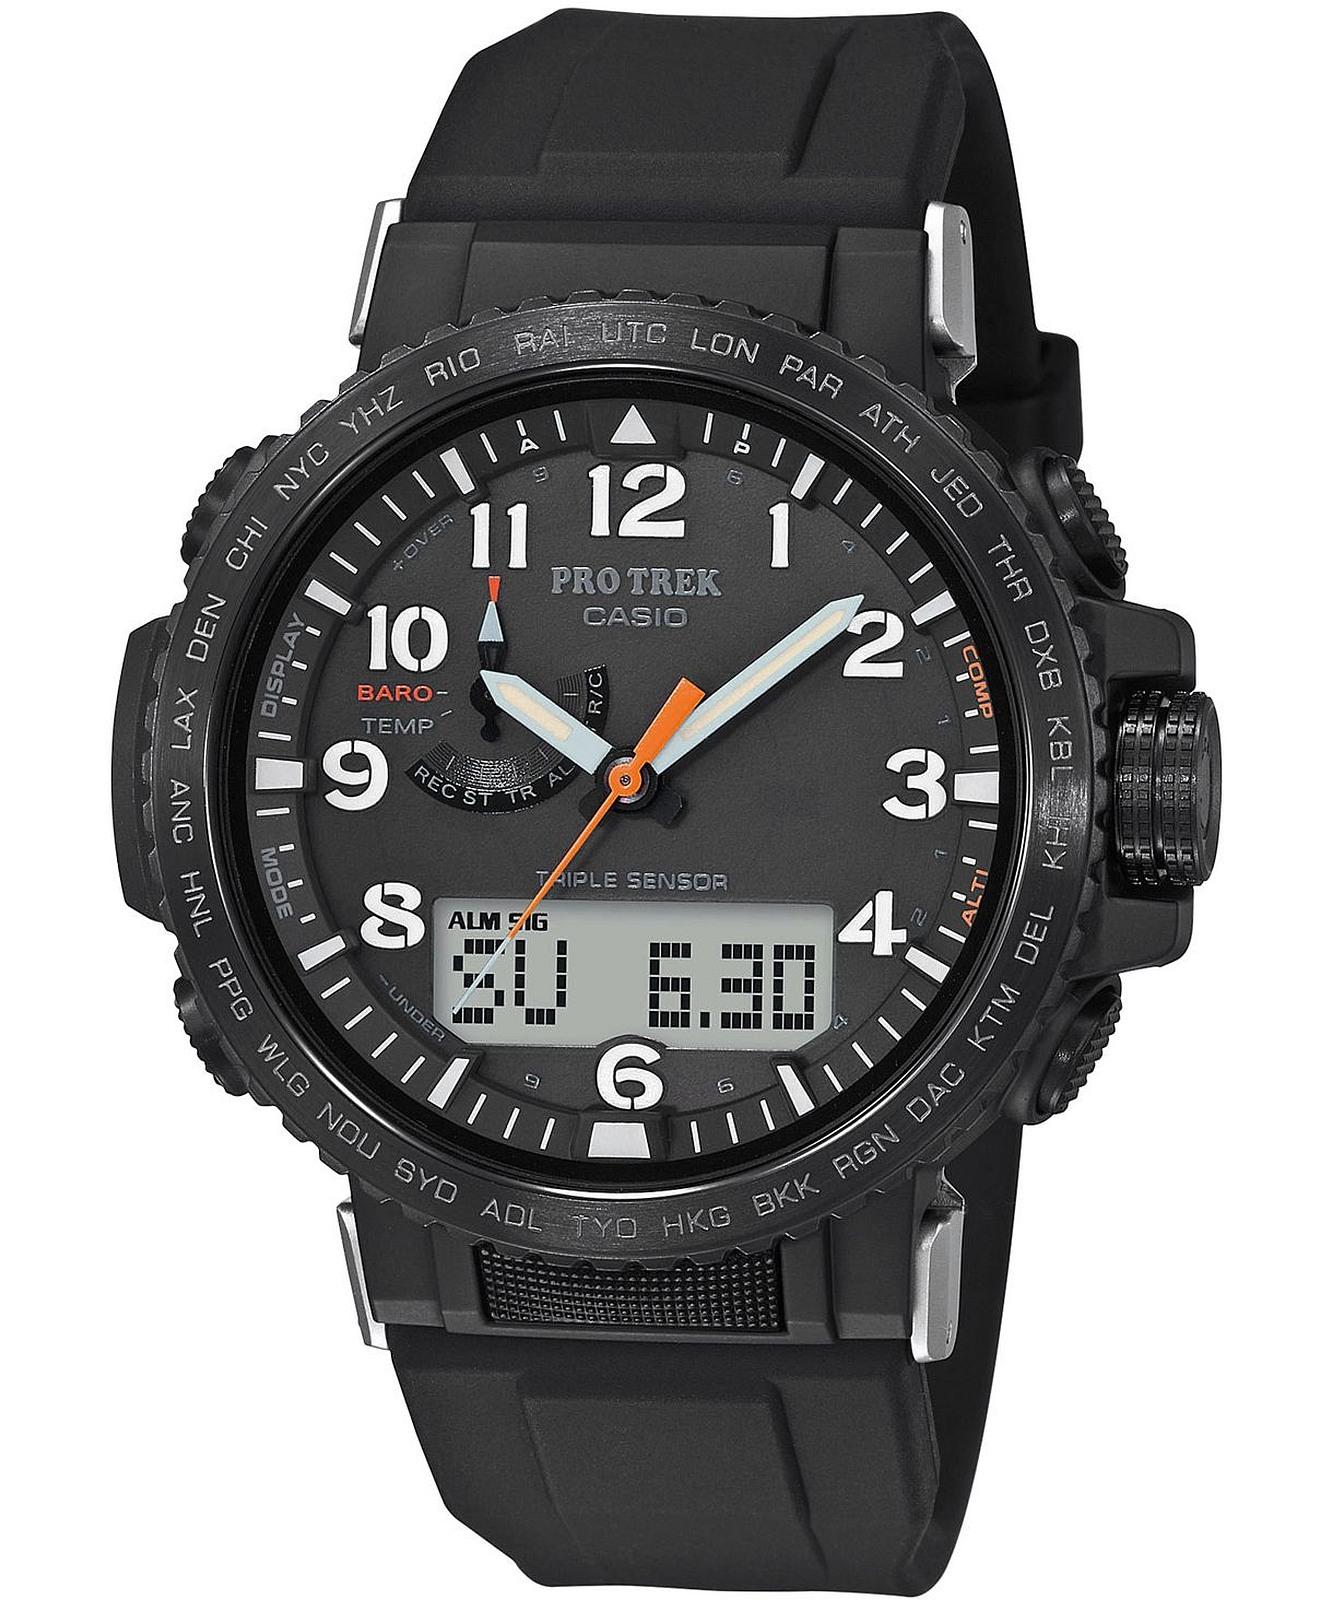 zegarek-meski-protrek-slim-design-radio-solar-prw-50y-1aer